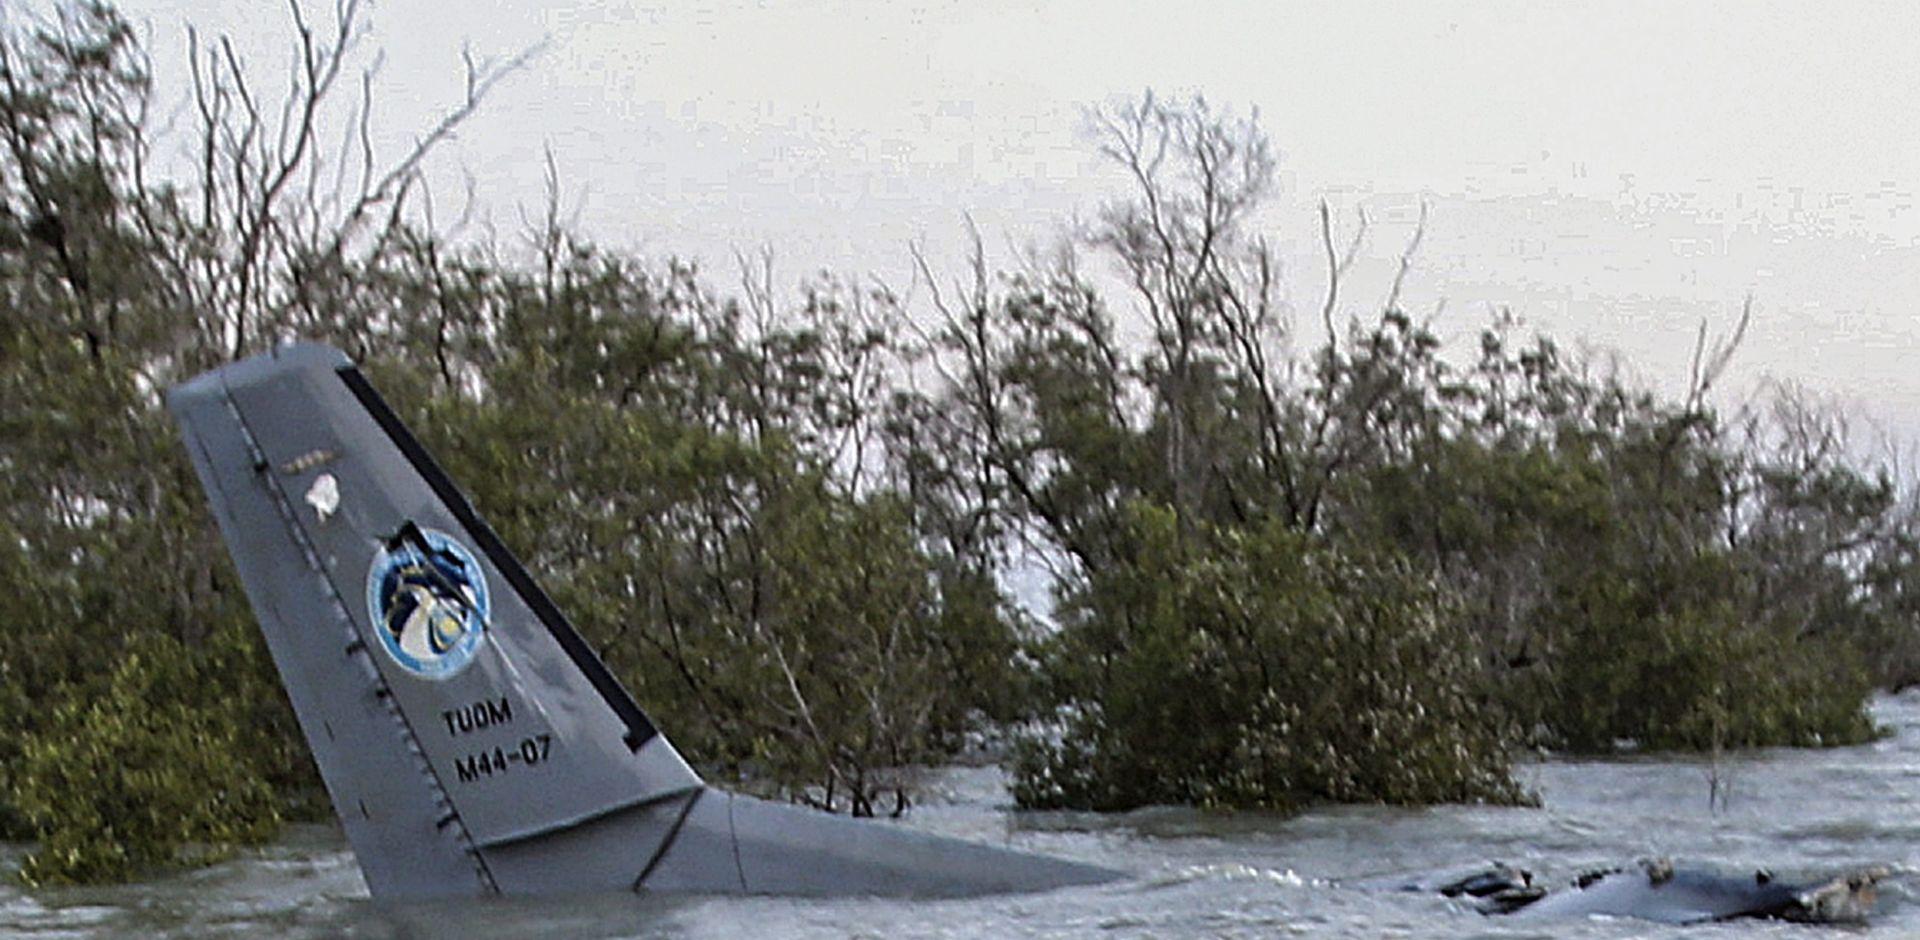 NESTALI BOEING 777: Pronađen dio zrakoplova u Mozambiku?